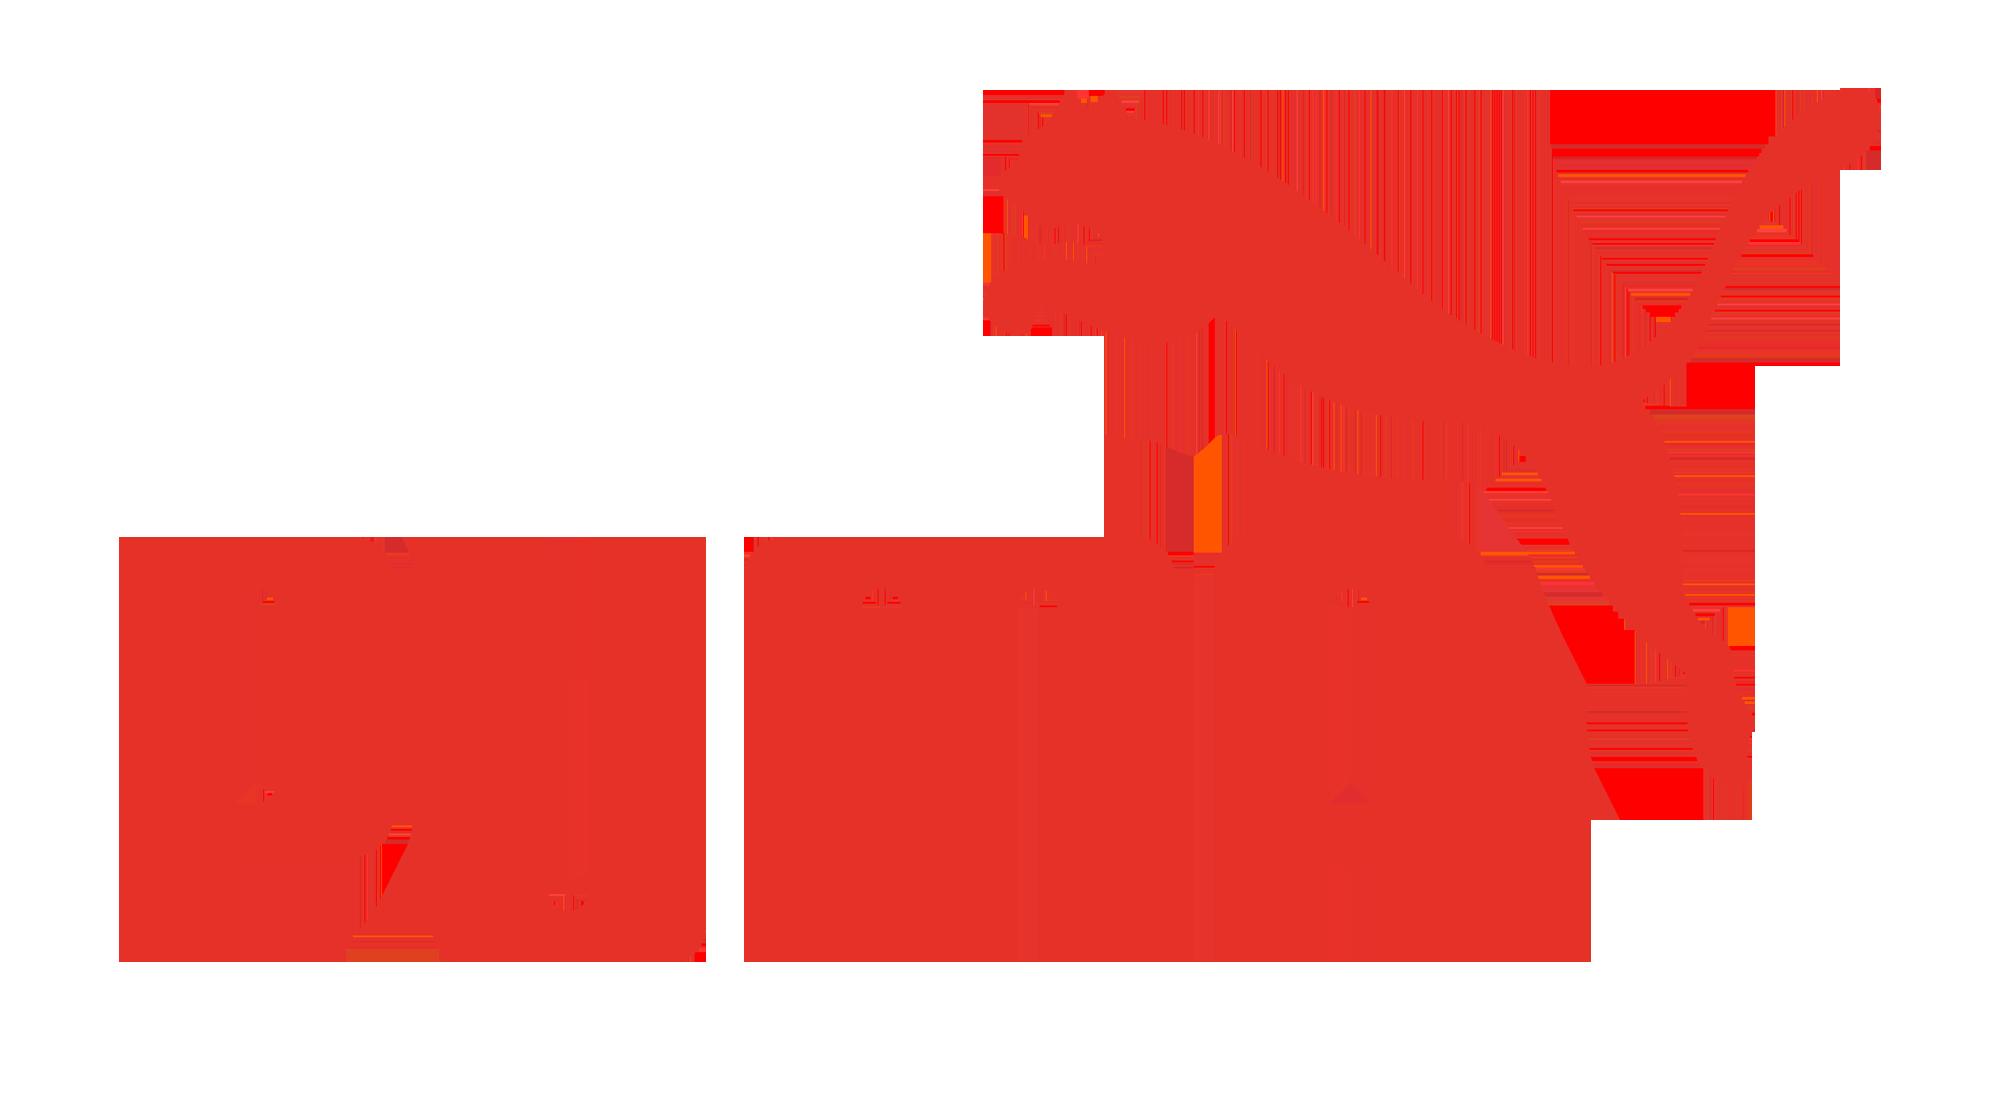 PUMA Logo, PUMA Symbol, Meaning, History and Evolution